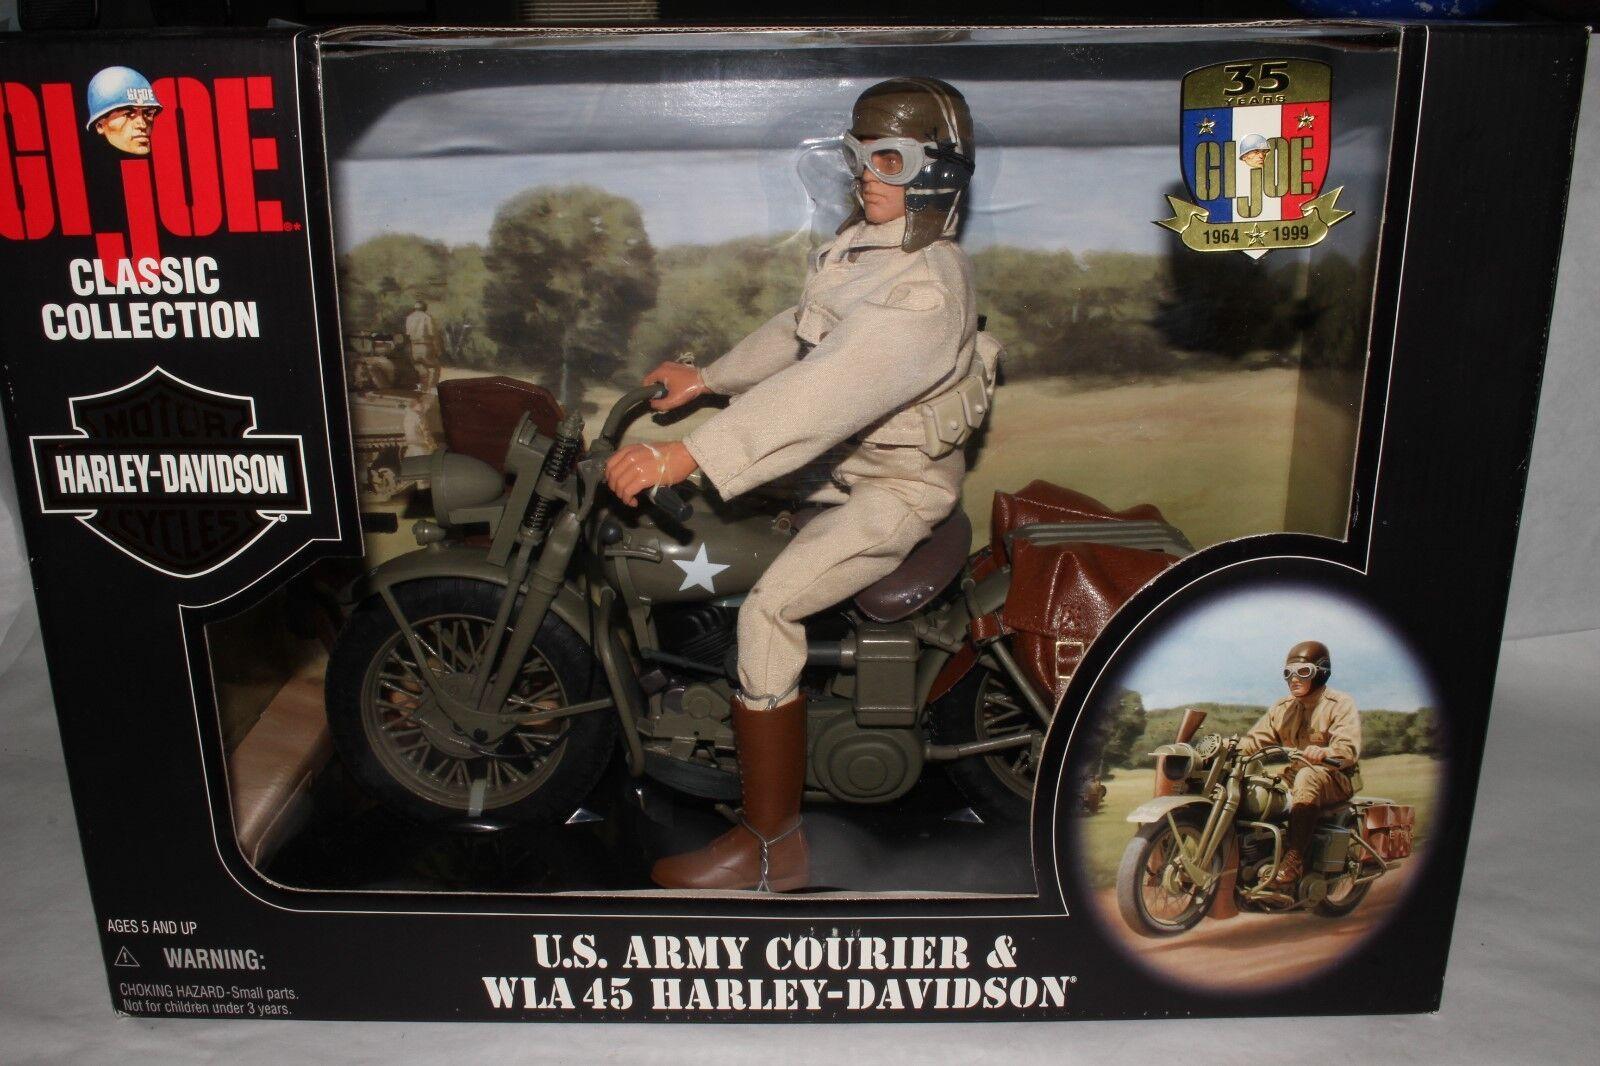 GI Joe U.S. Army Courier & WLA 45 Harley-Davidson Motorcycle Boxed